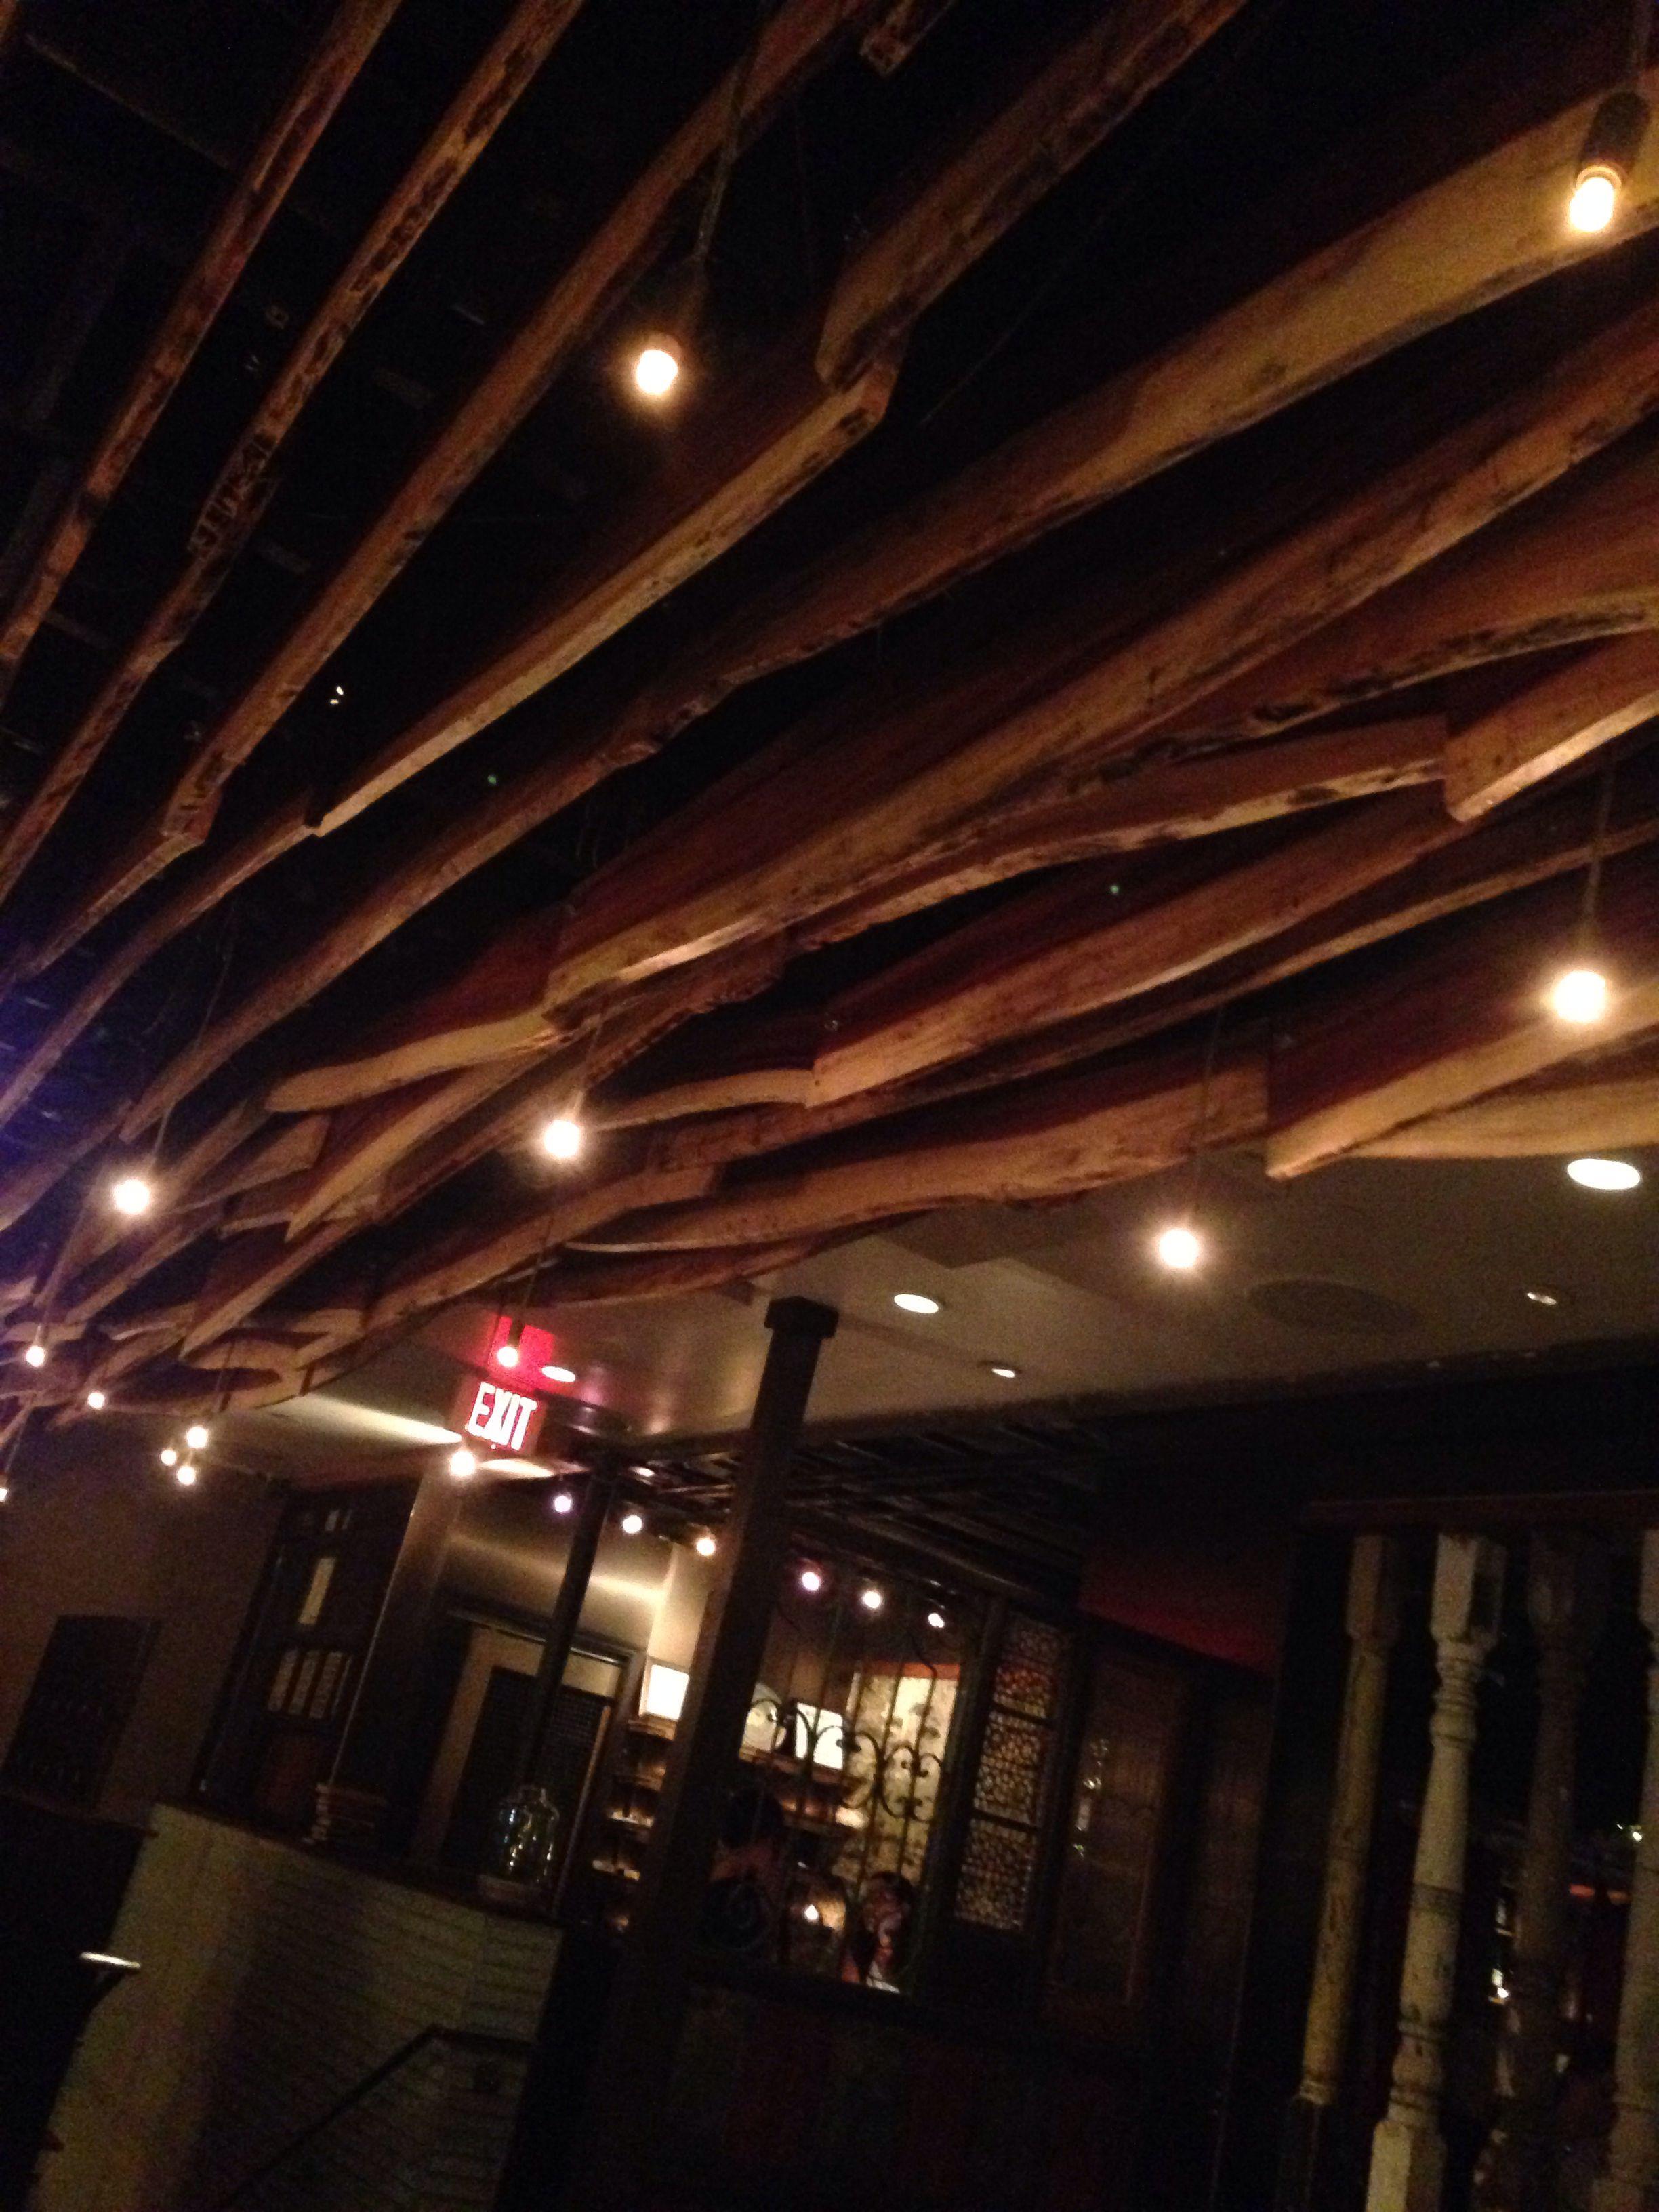 wood plank ceiling light installation prep kitchen little italy san diego - Prep Kitchen Little Italy